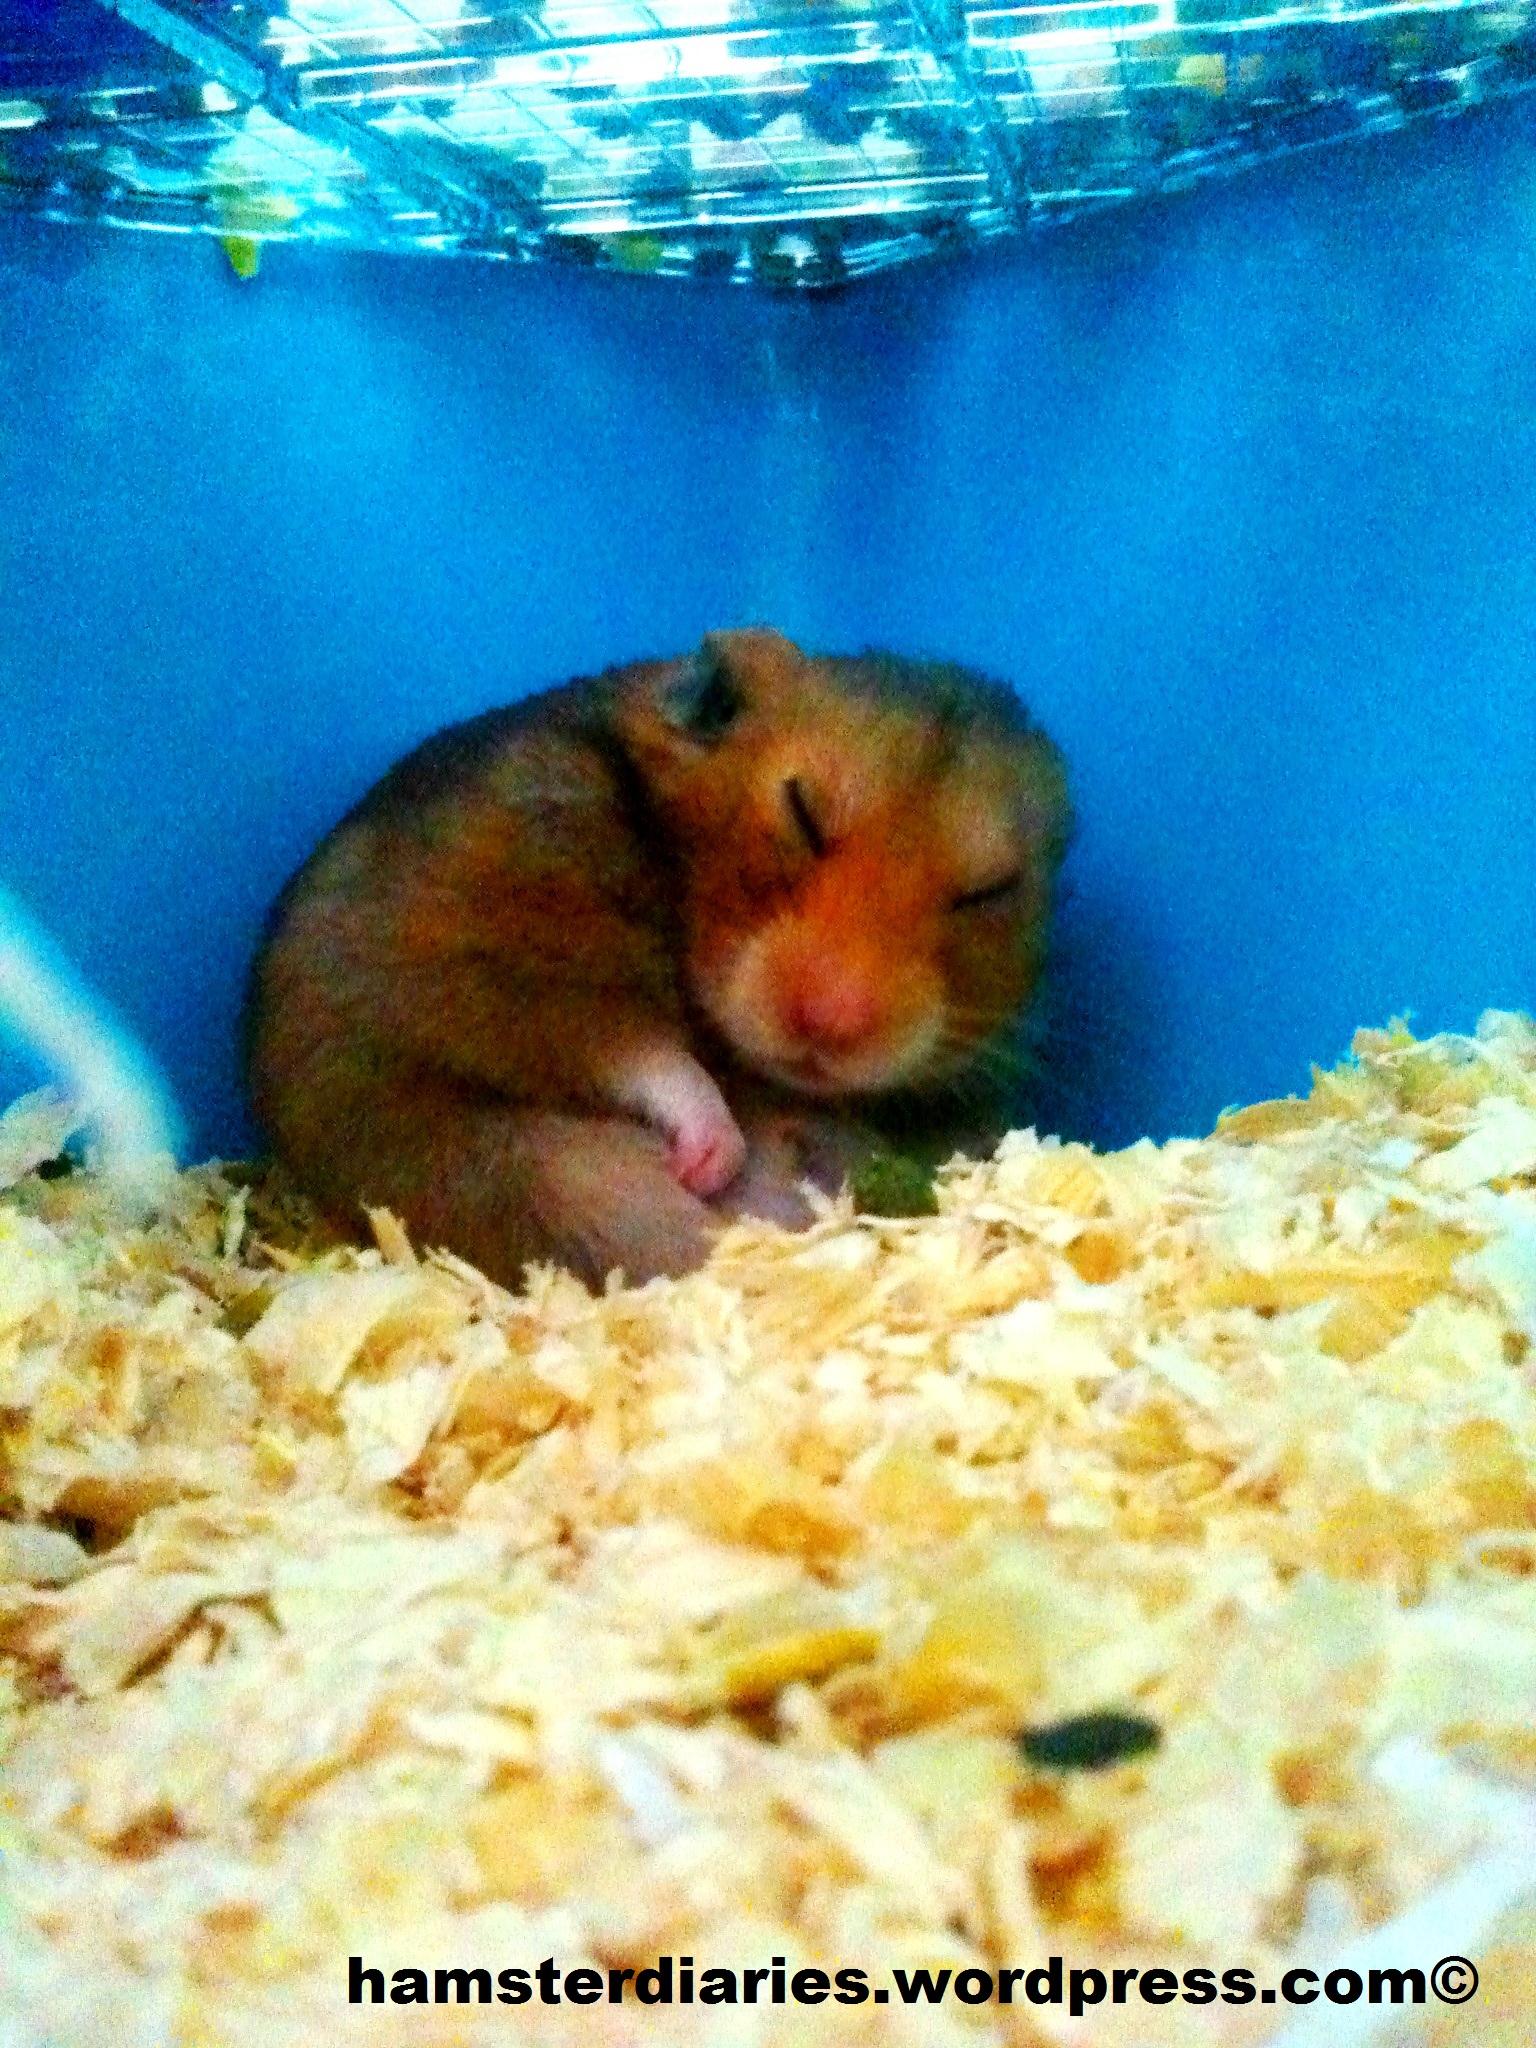 Hamster xxx дренеnaked варкрафт porn photos